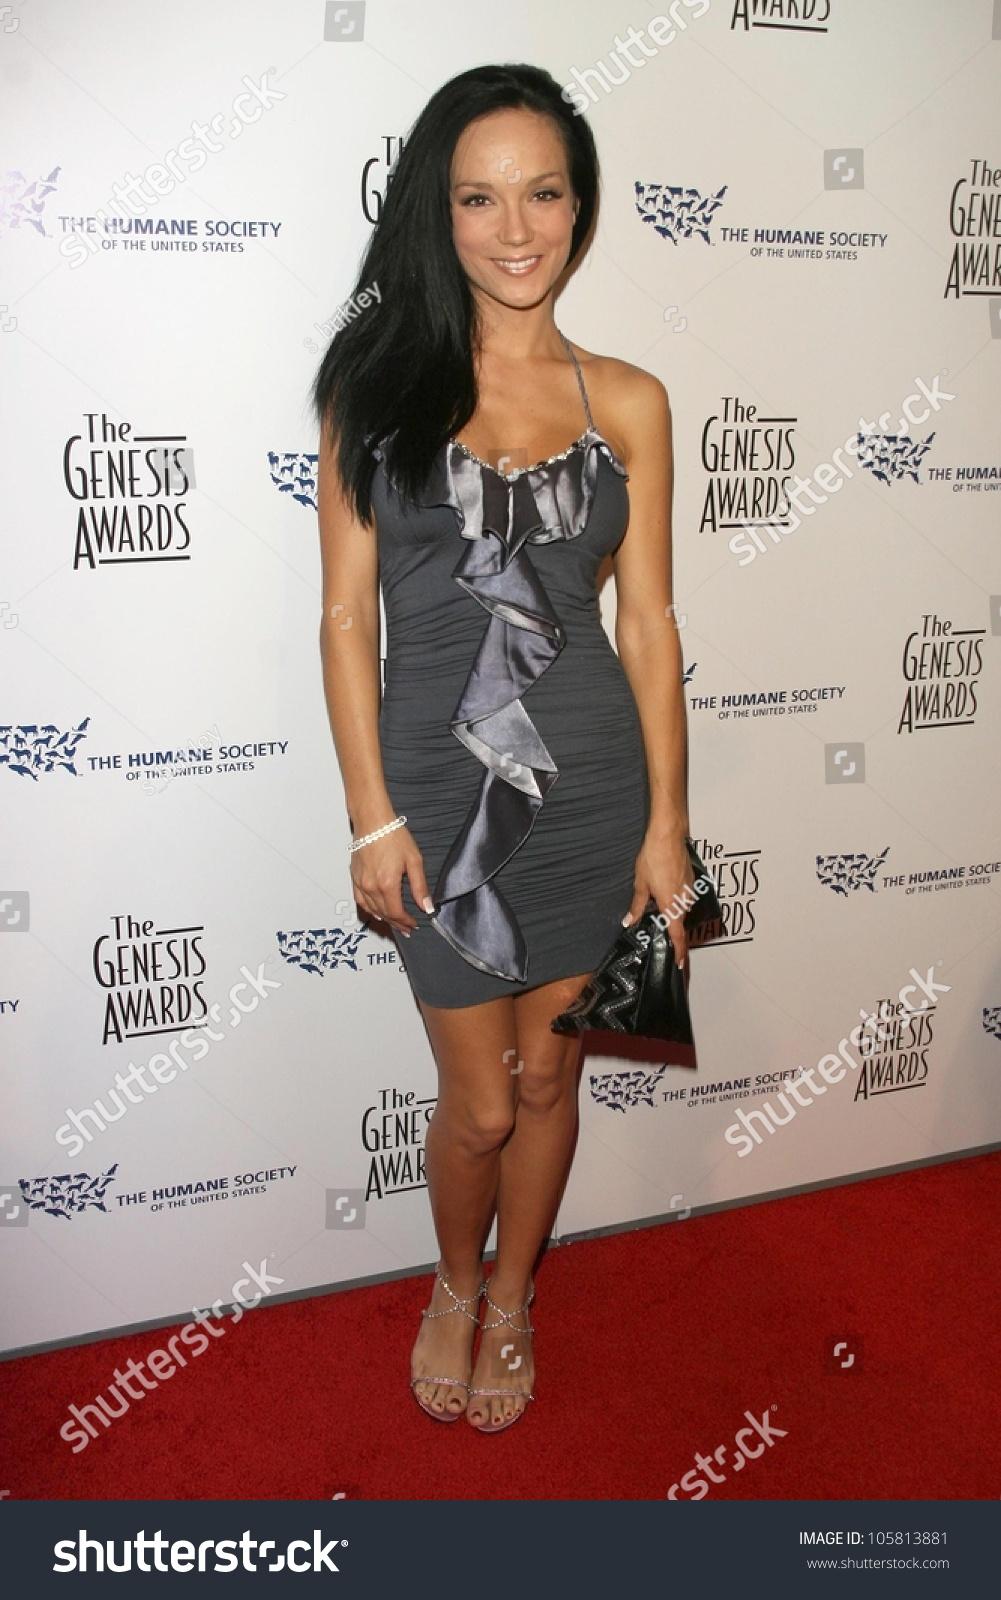 Krystal Garib